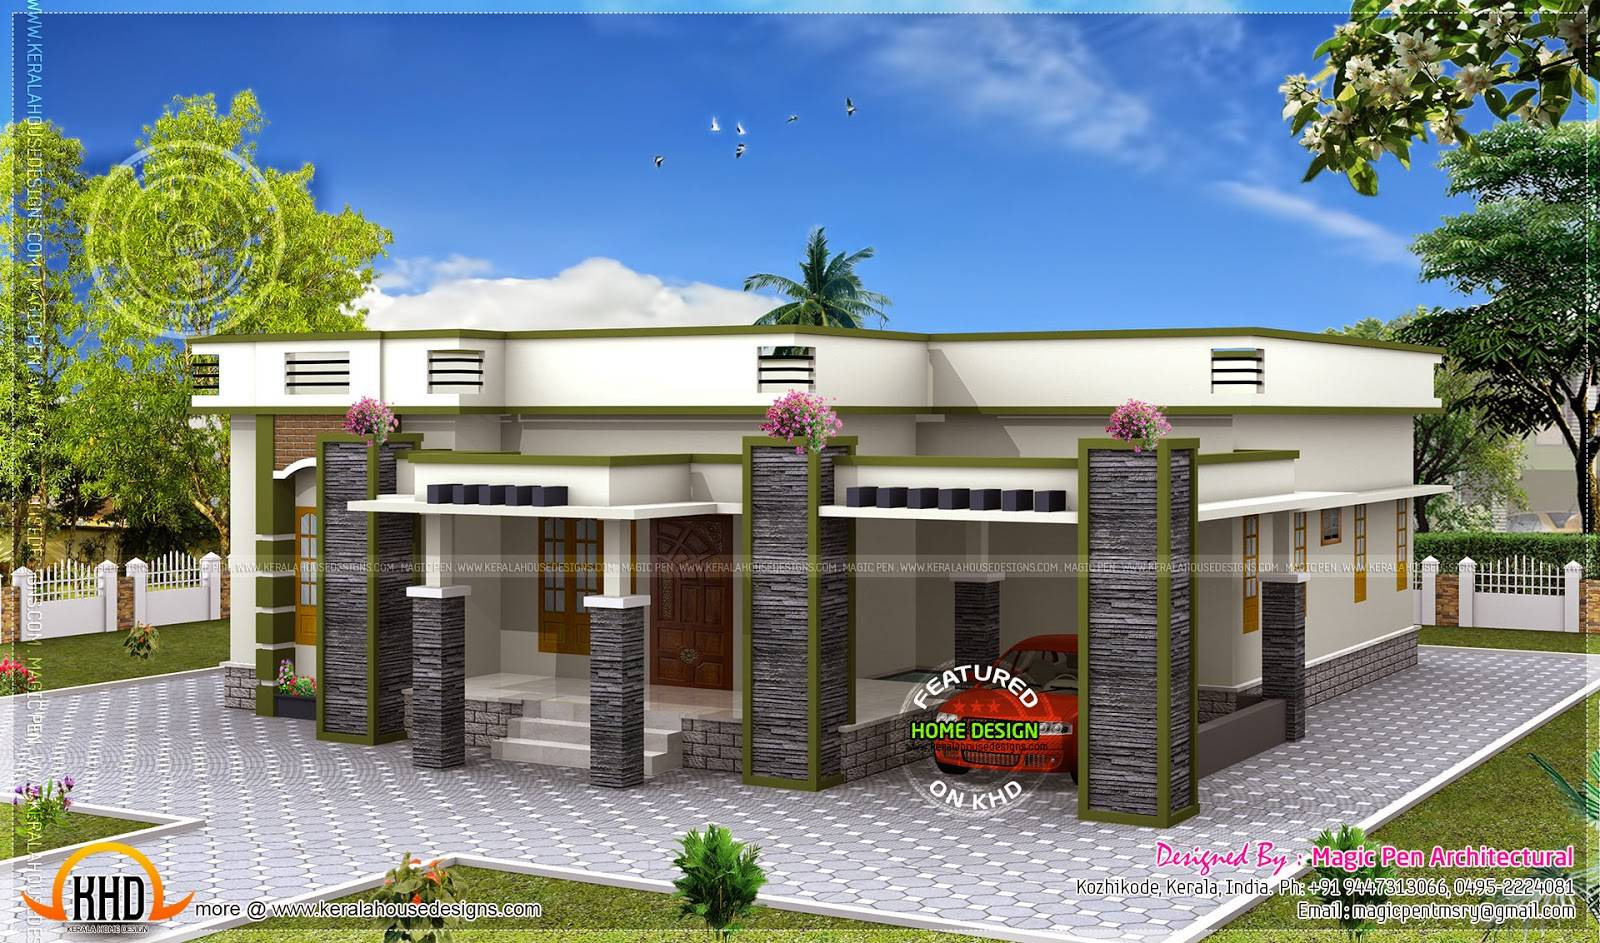 Trending Flat Roof likewise Kerala Interior Design Ideas moreover Idees Pour La Deco Exterieur De La Maison in addition The Frangipani Marari Beach Mararikulam also Saudi Villa Floor Plan Design. on kerala style home design